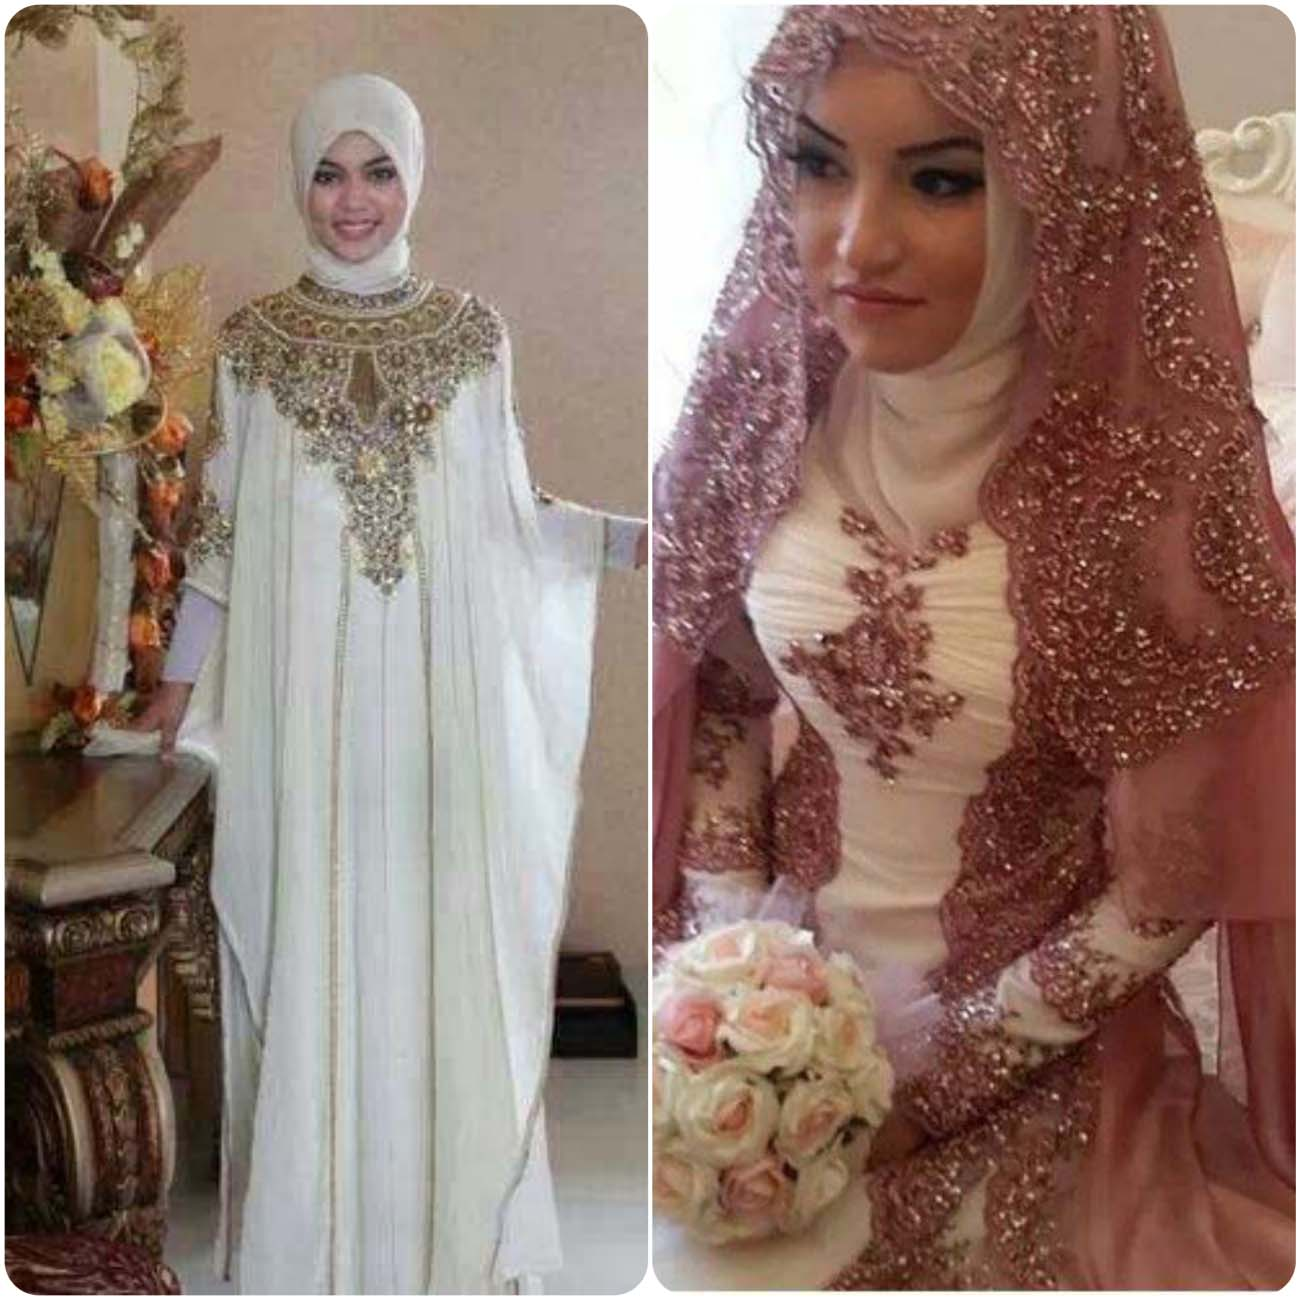 Designers Abaya Dresses Designs For Wedding Bridals 2016-2017...styloplanet (16)